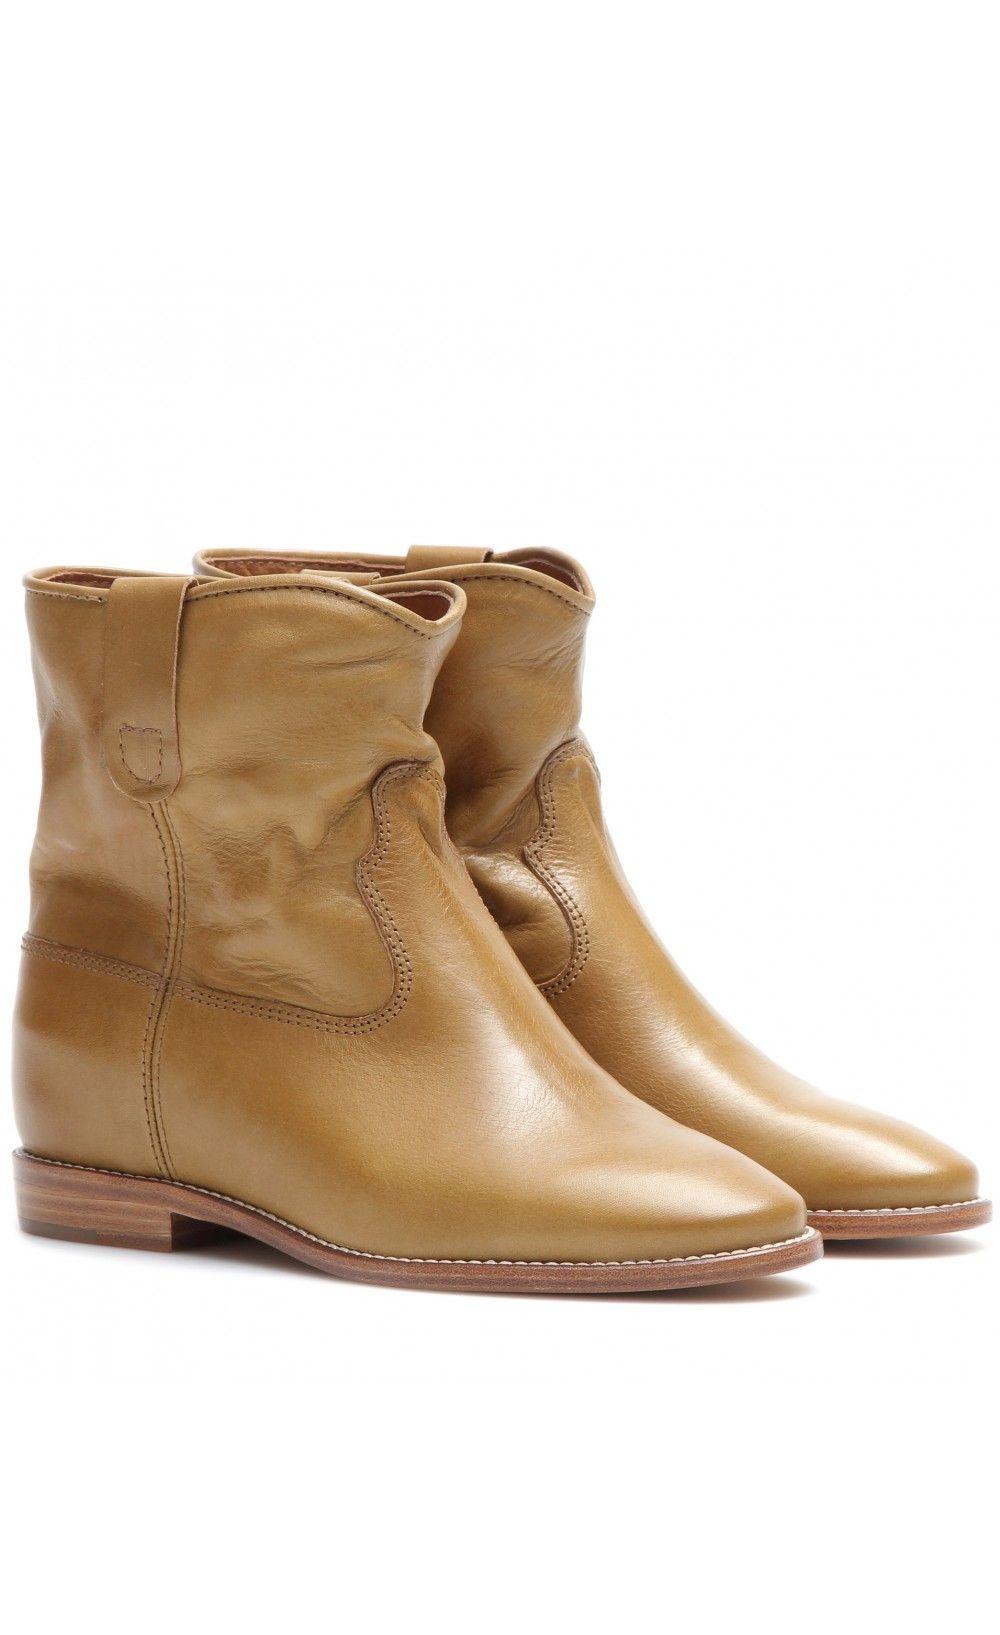 4b0e9e3c9b Isabel Marant ÉToile Cluster Leather Boots Camel - Isabel Marant ...